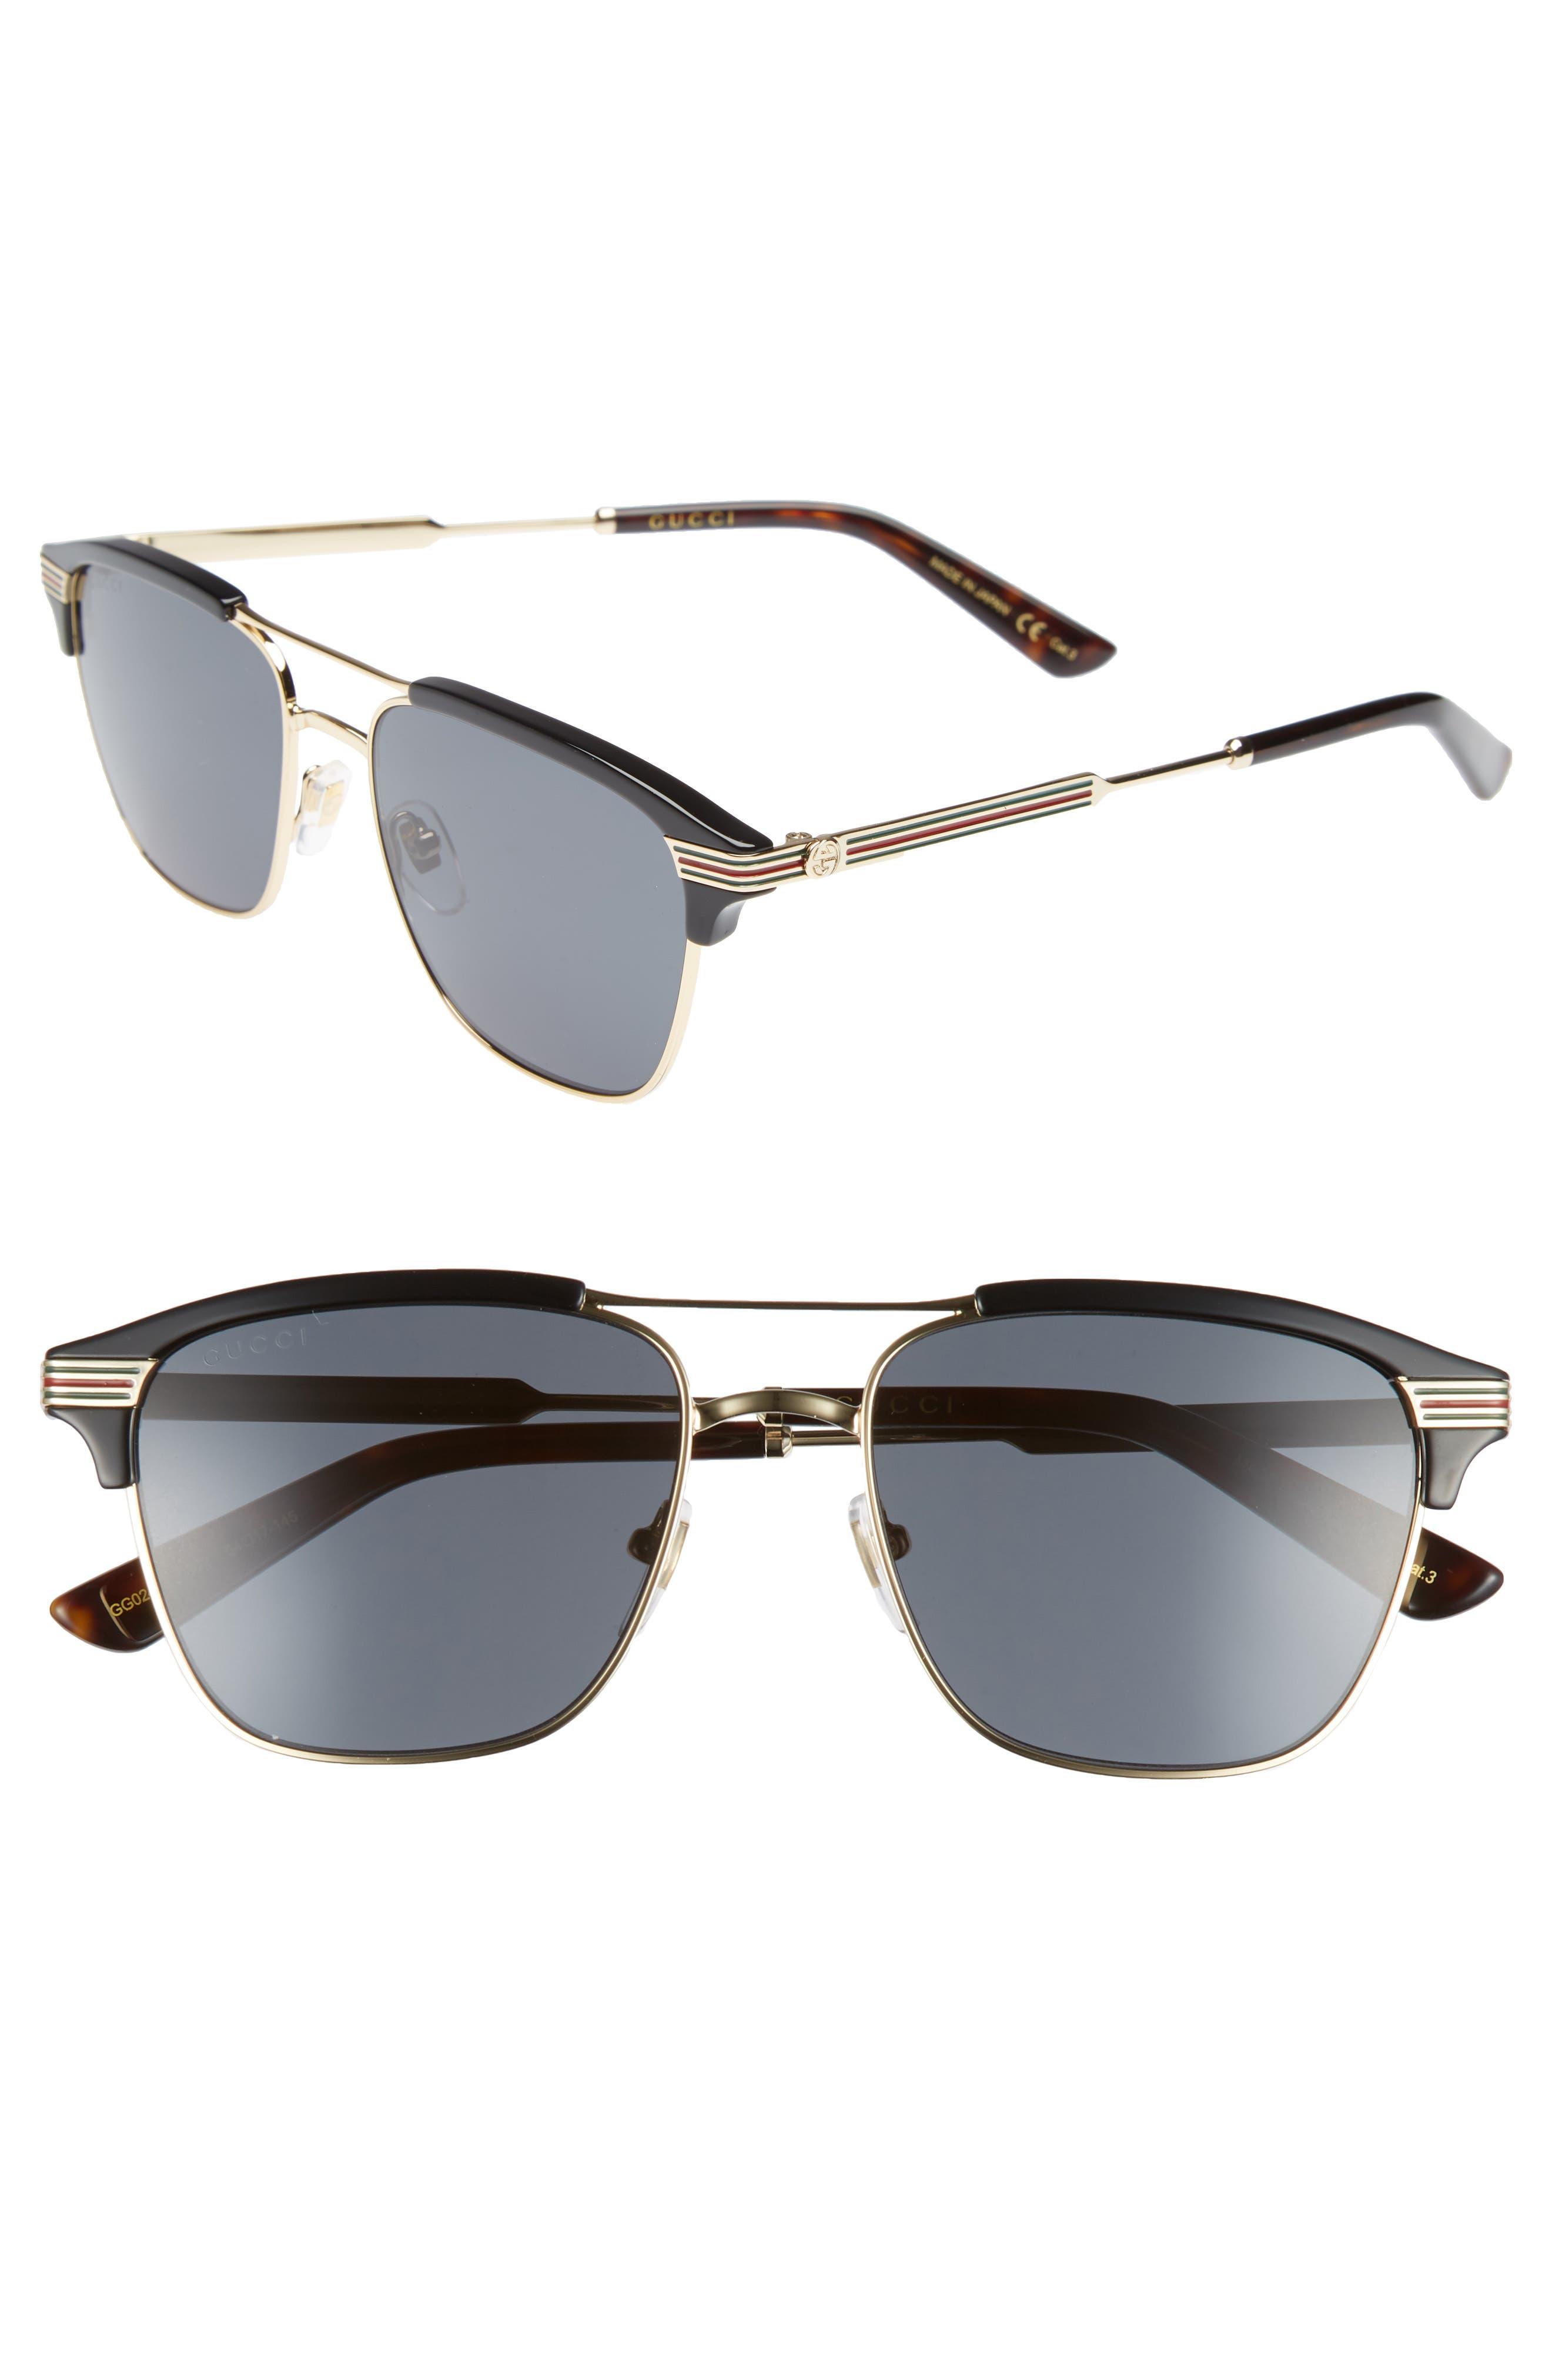 Main Image - Gucci Cruise 54mm Sunglasses